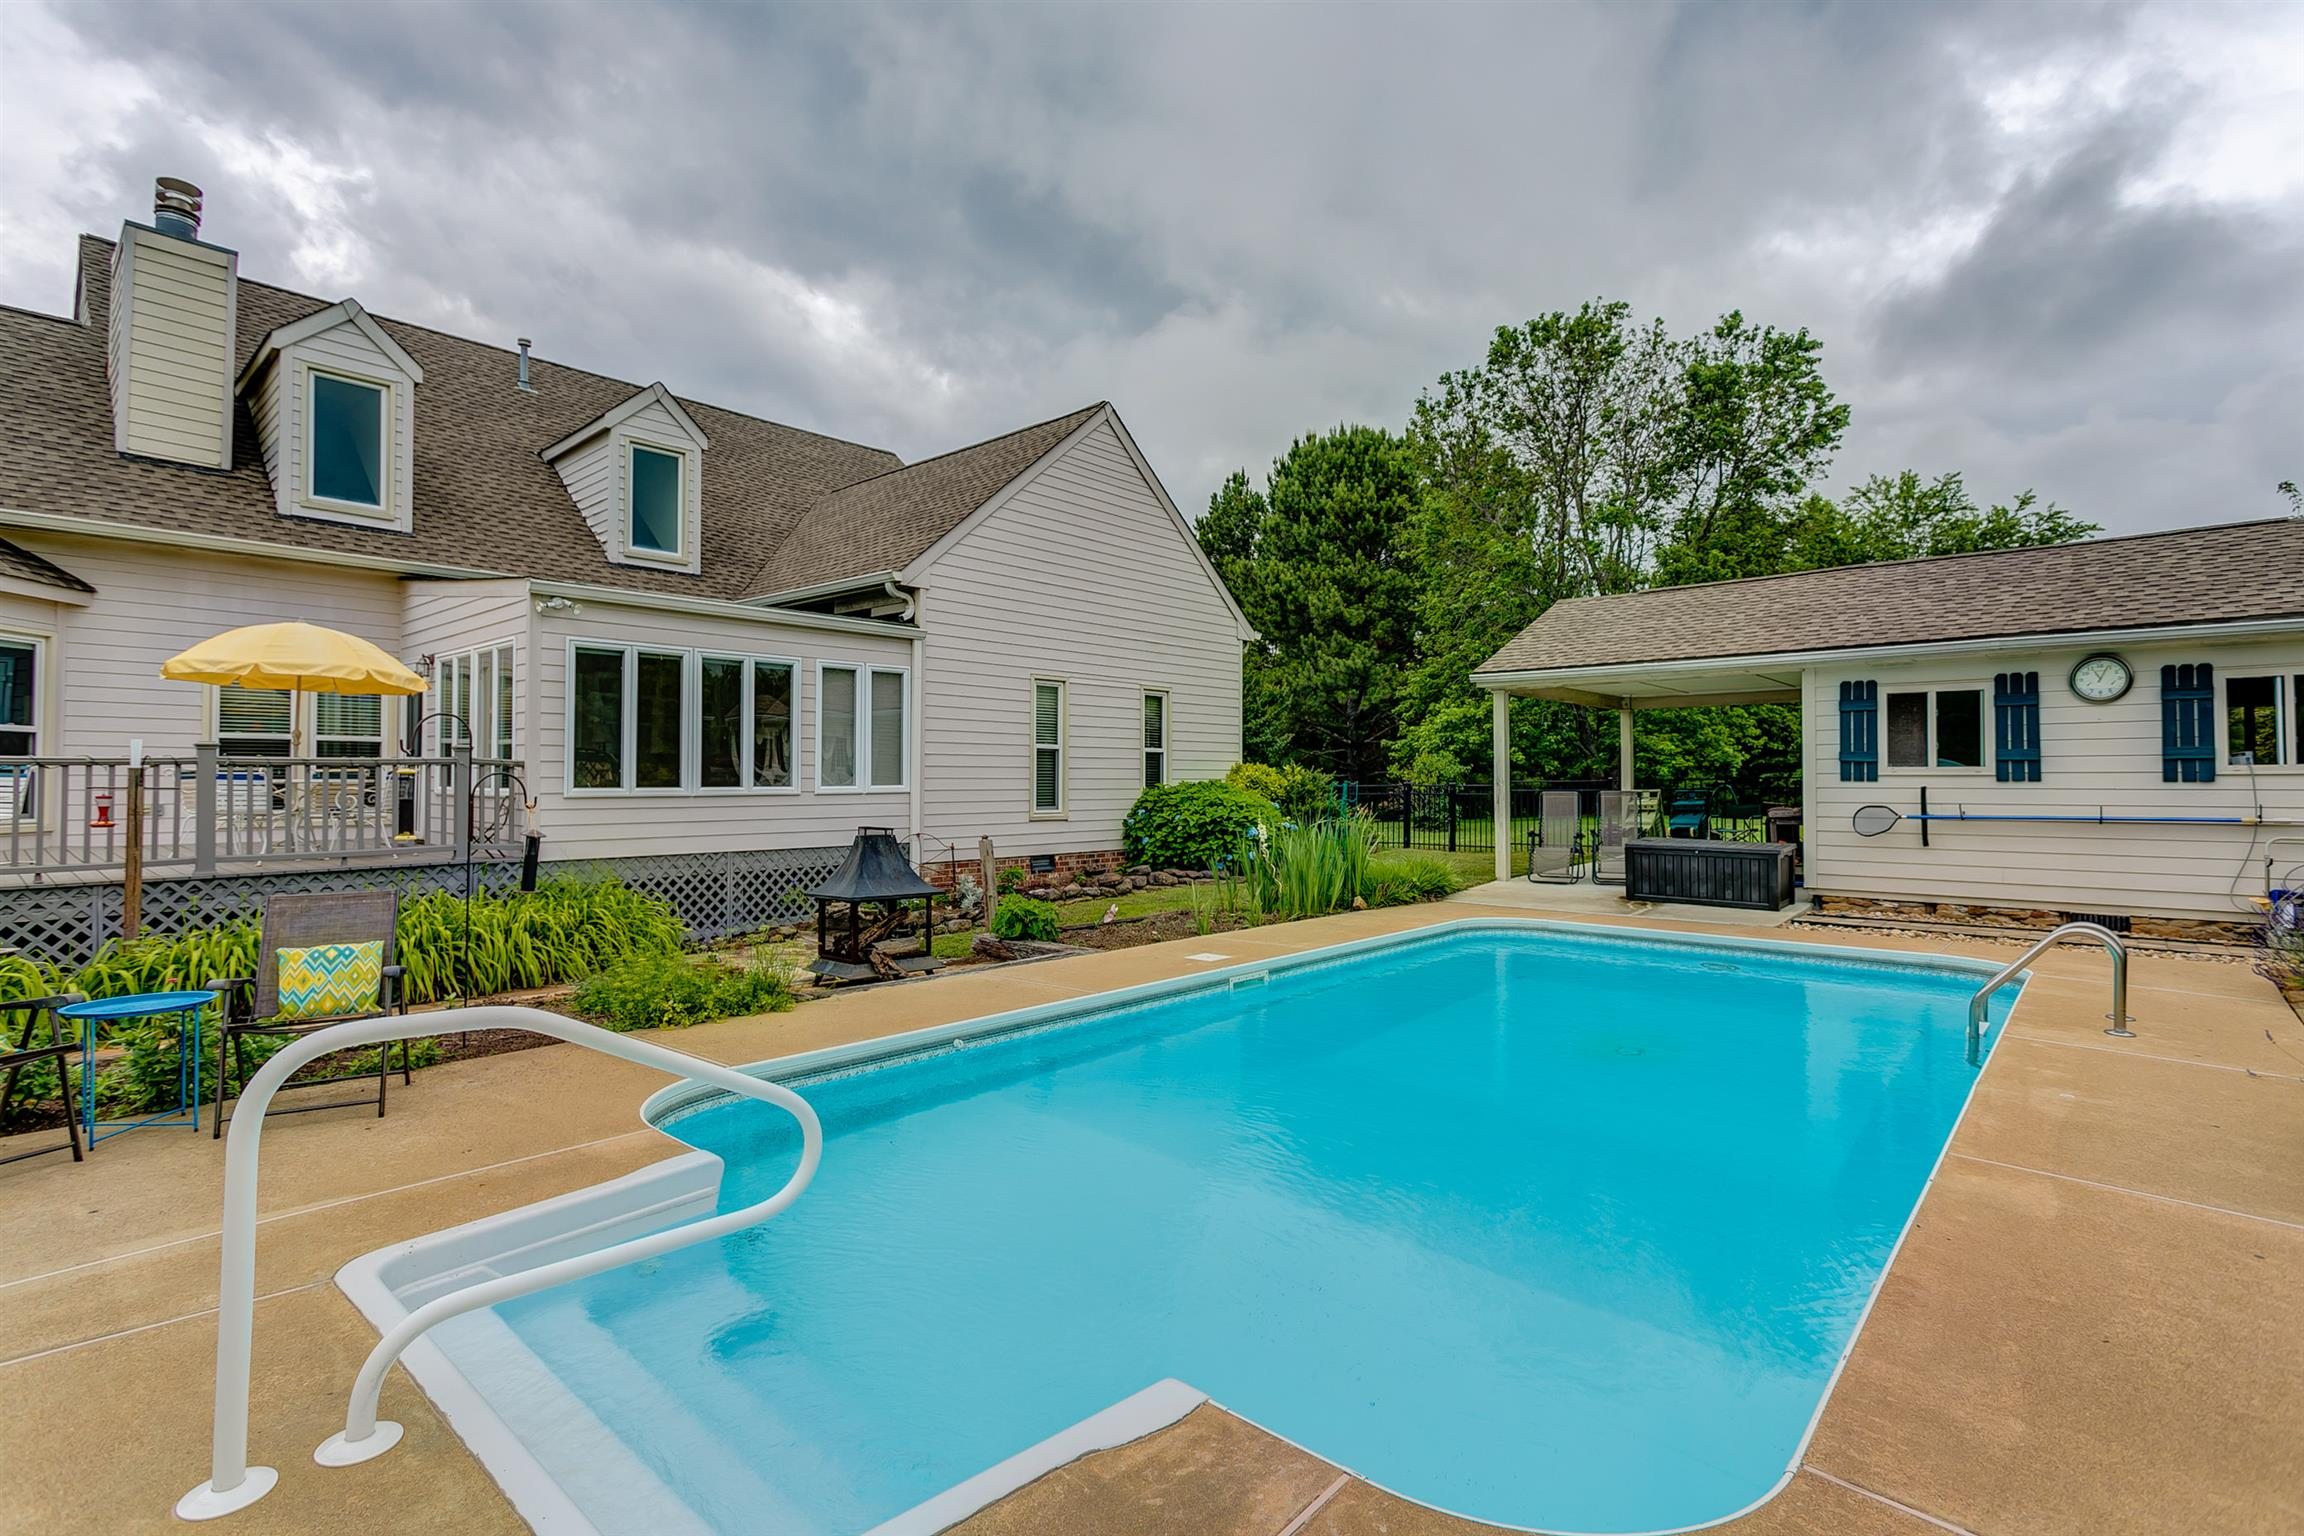 6631 Fannie Daniels Rd, College Grove, TN 37046 - College Grove, TN real estate listing